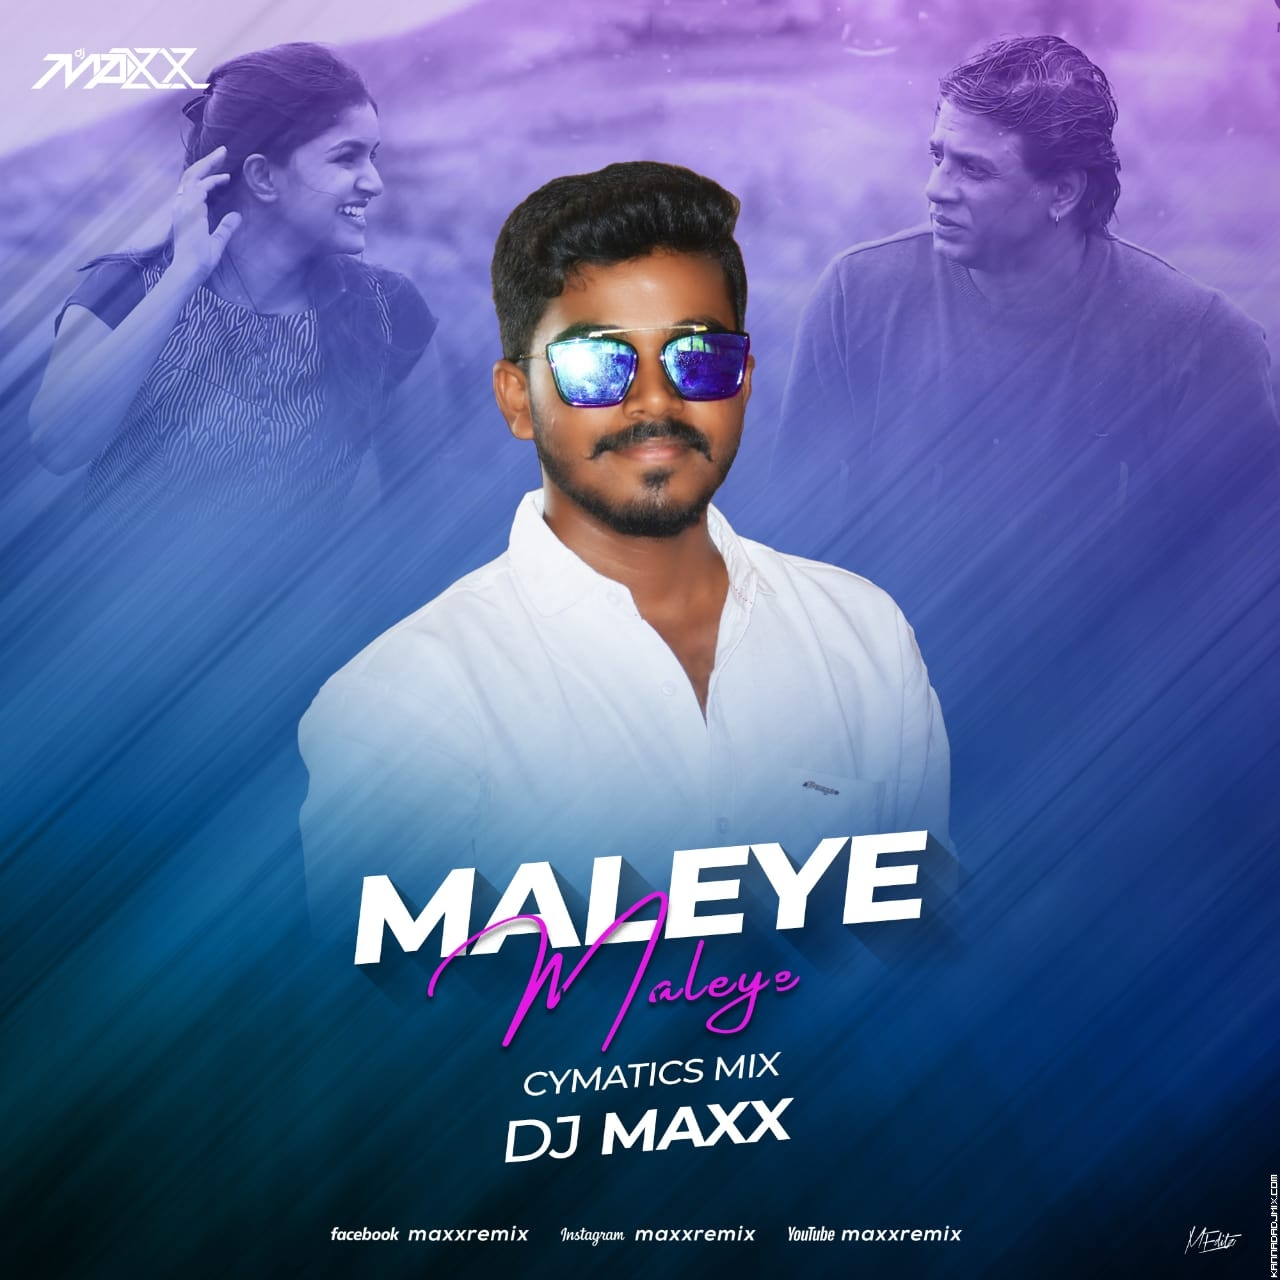 MALEYE MALEYE (Cymatics Mix) DJ Maxx.mp3